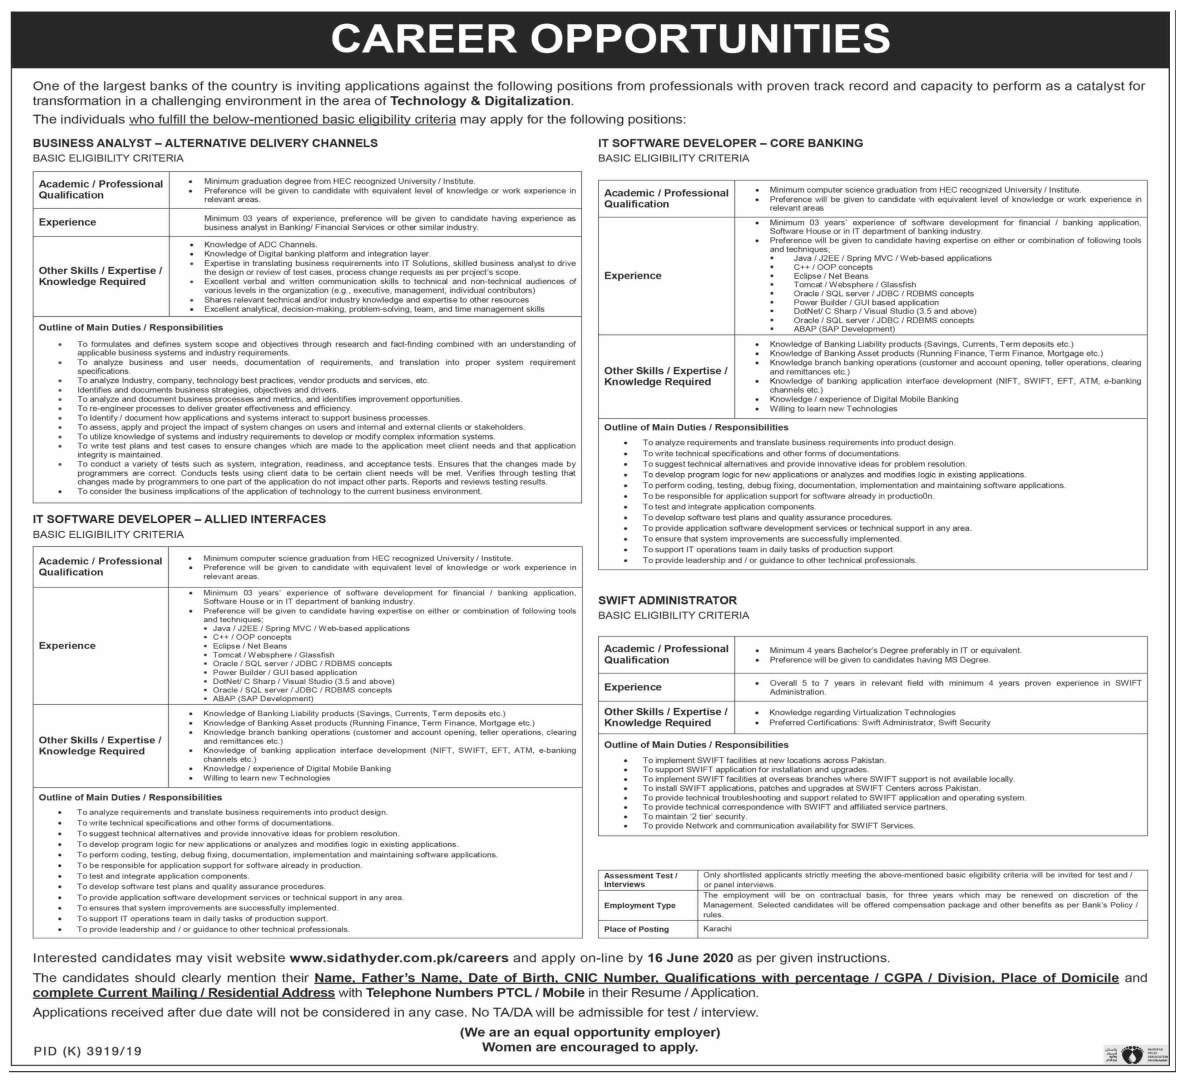 Business Analyst & IT Software Developer Jobs 2020